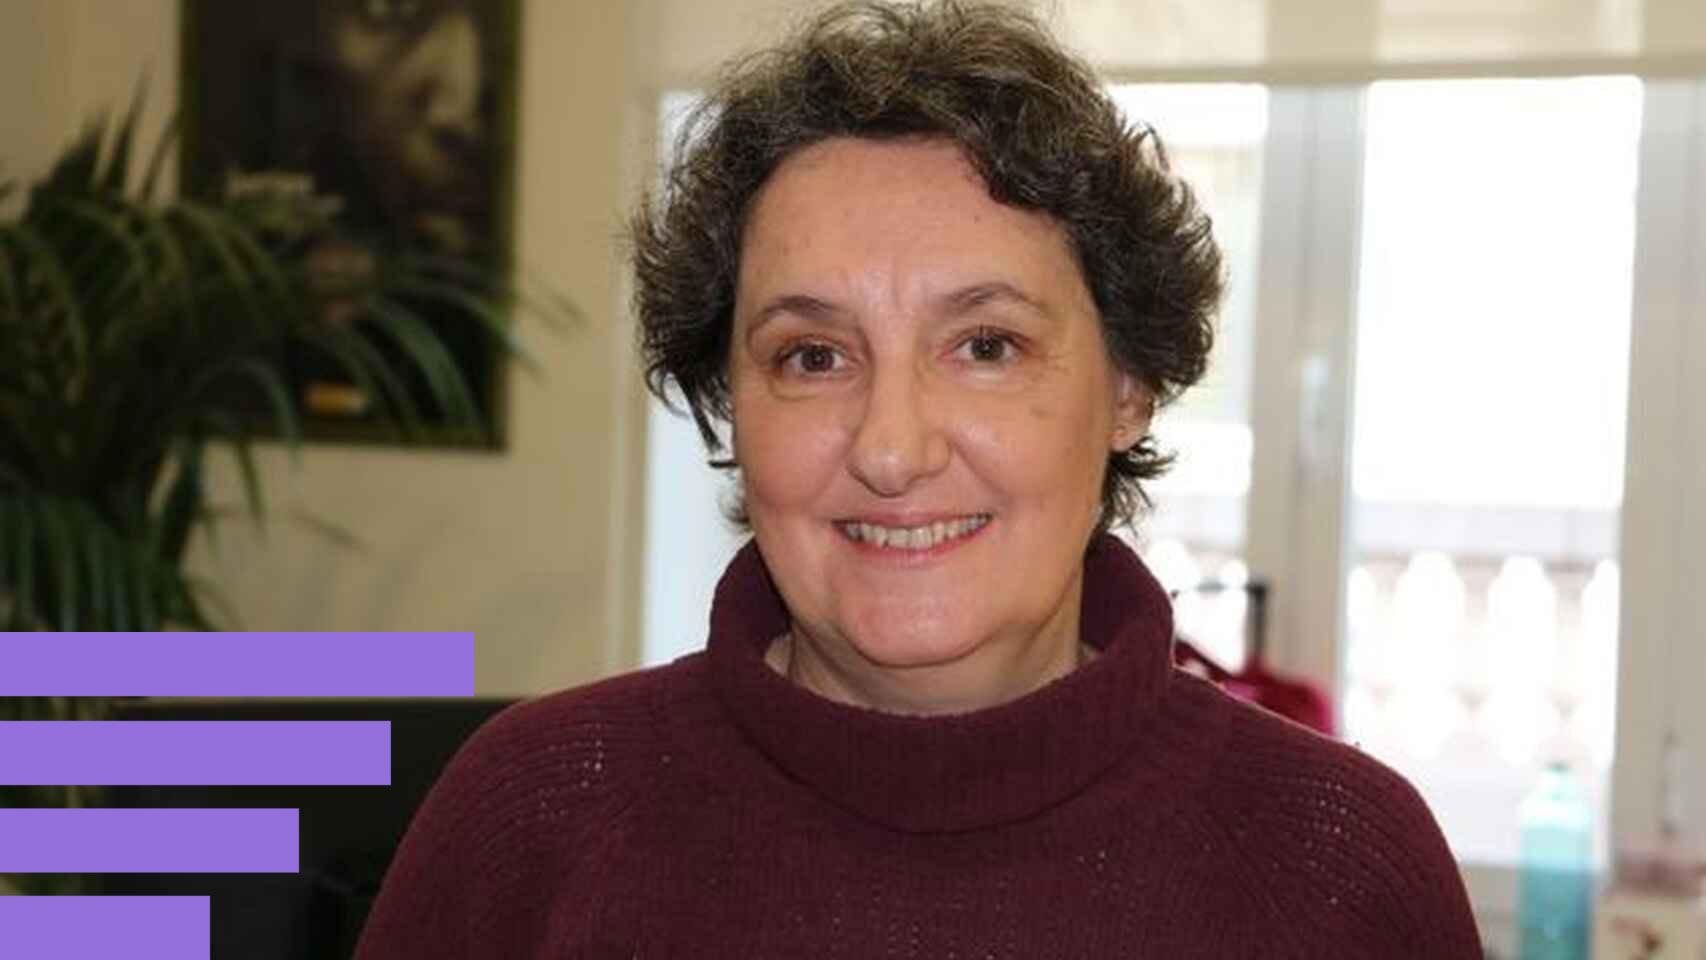 La directora del Instituto de la Mujer, Beatriz Gimeno.